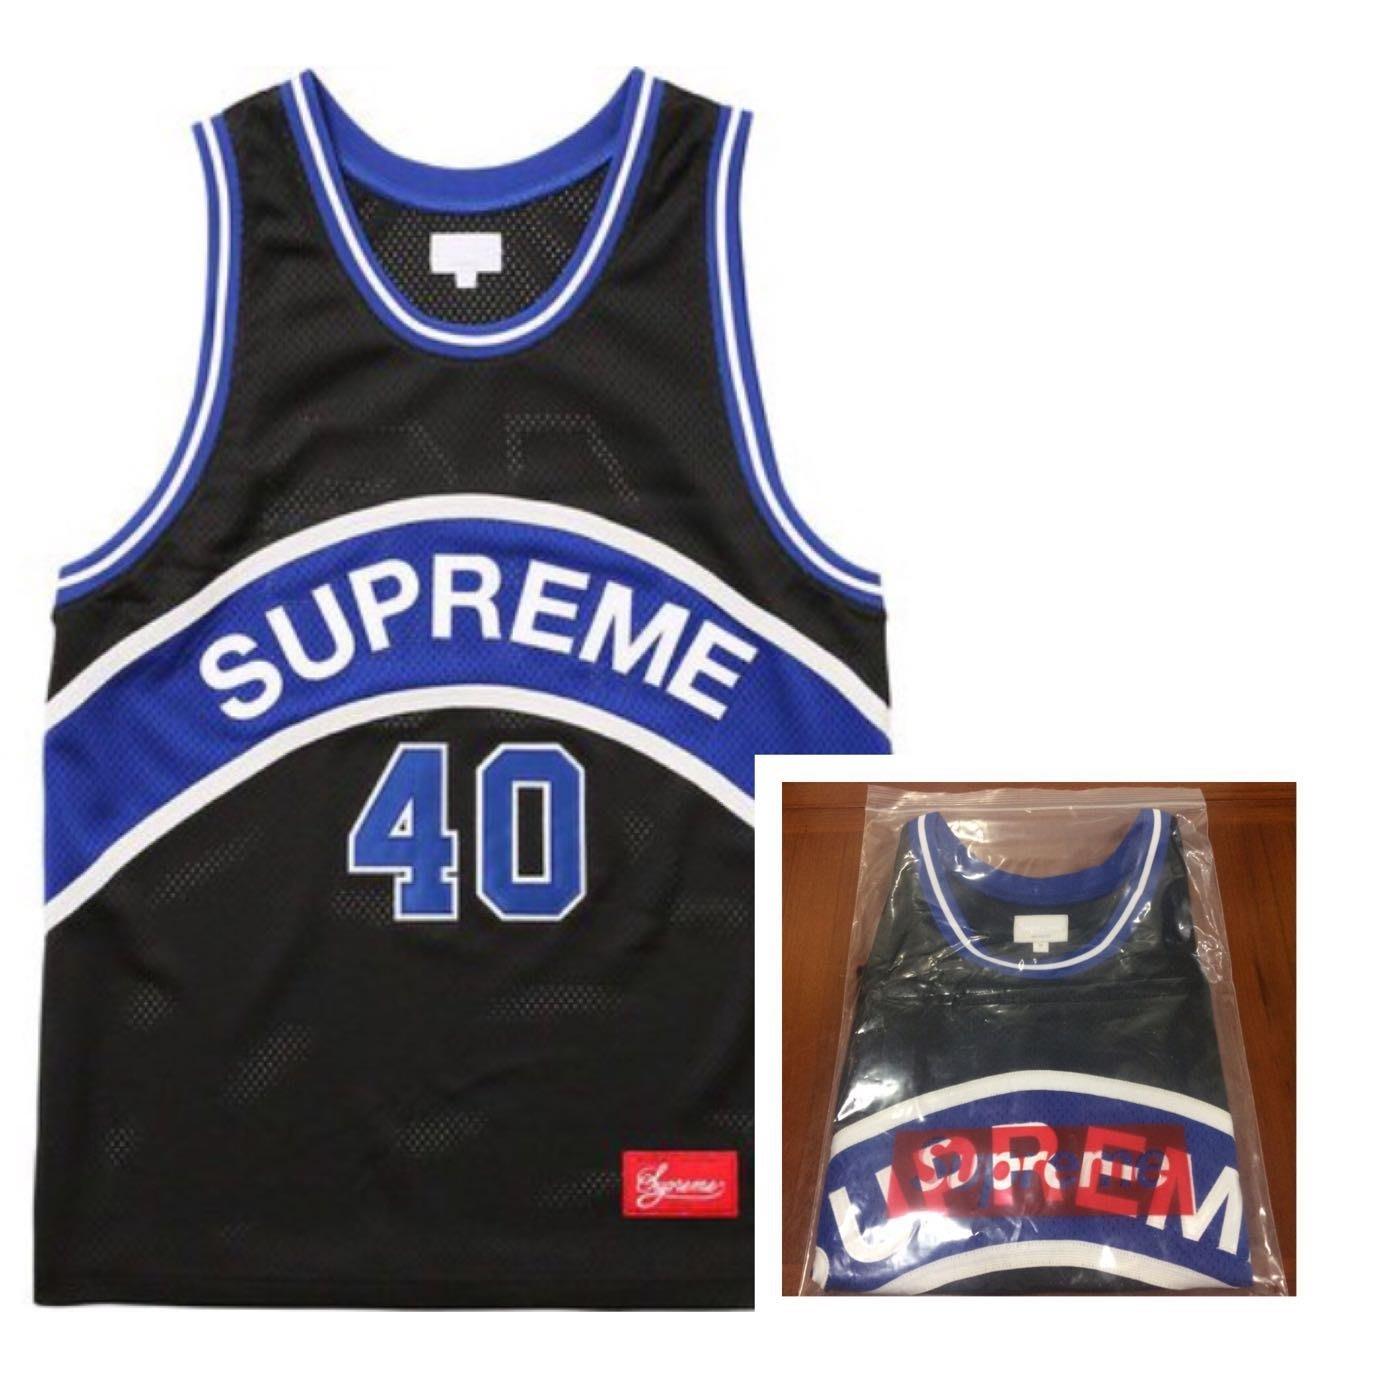 f8d5a1003 限時優惠Supreme SS17 Curve Basketball Jersey 籃球衣黑藍M號